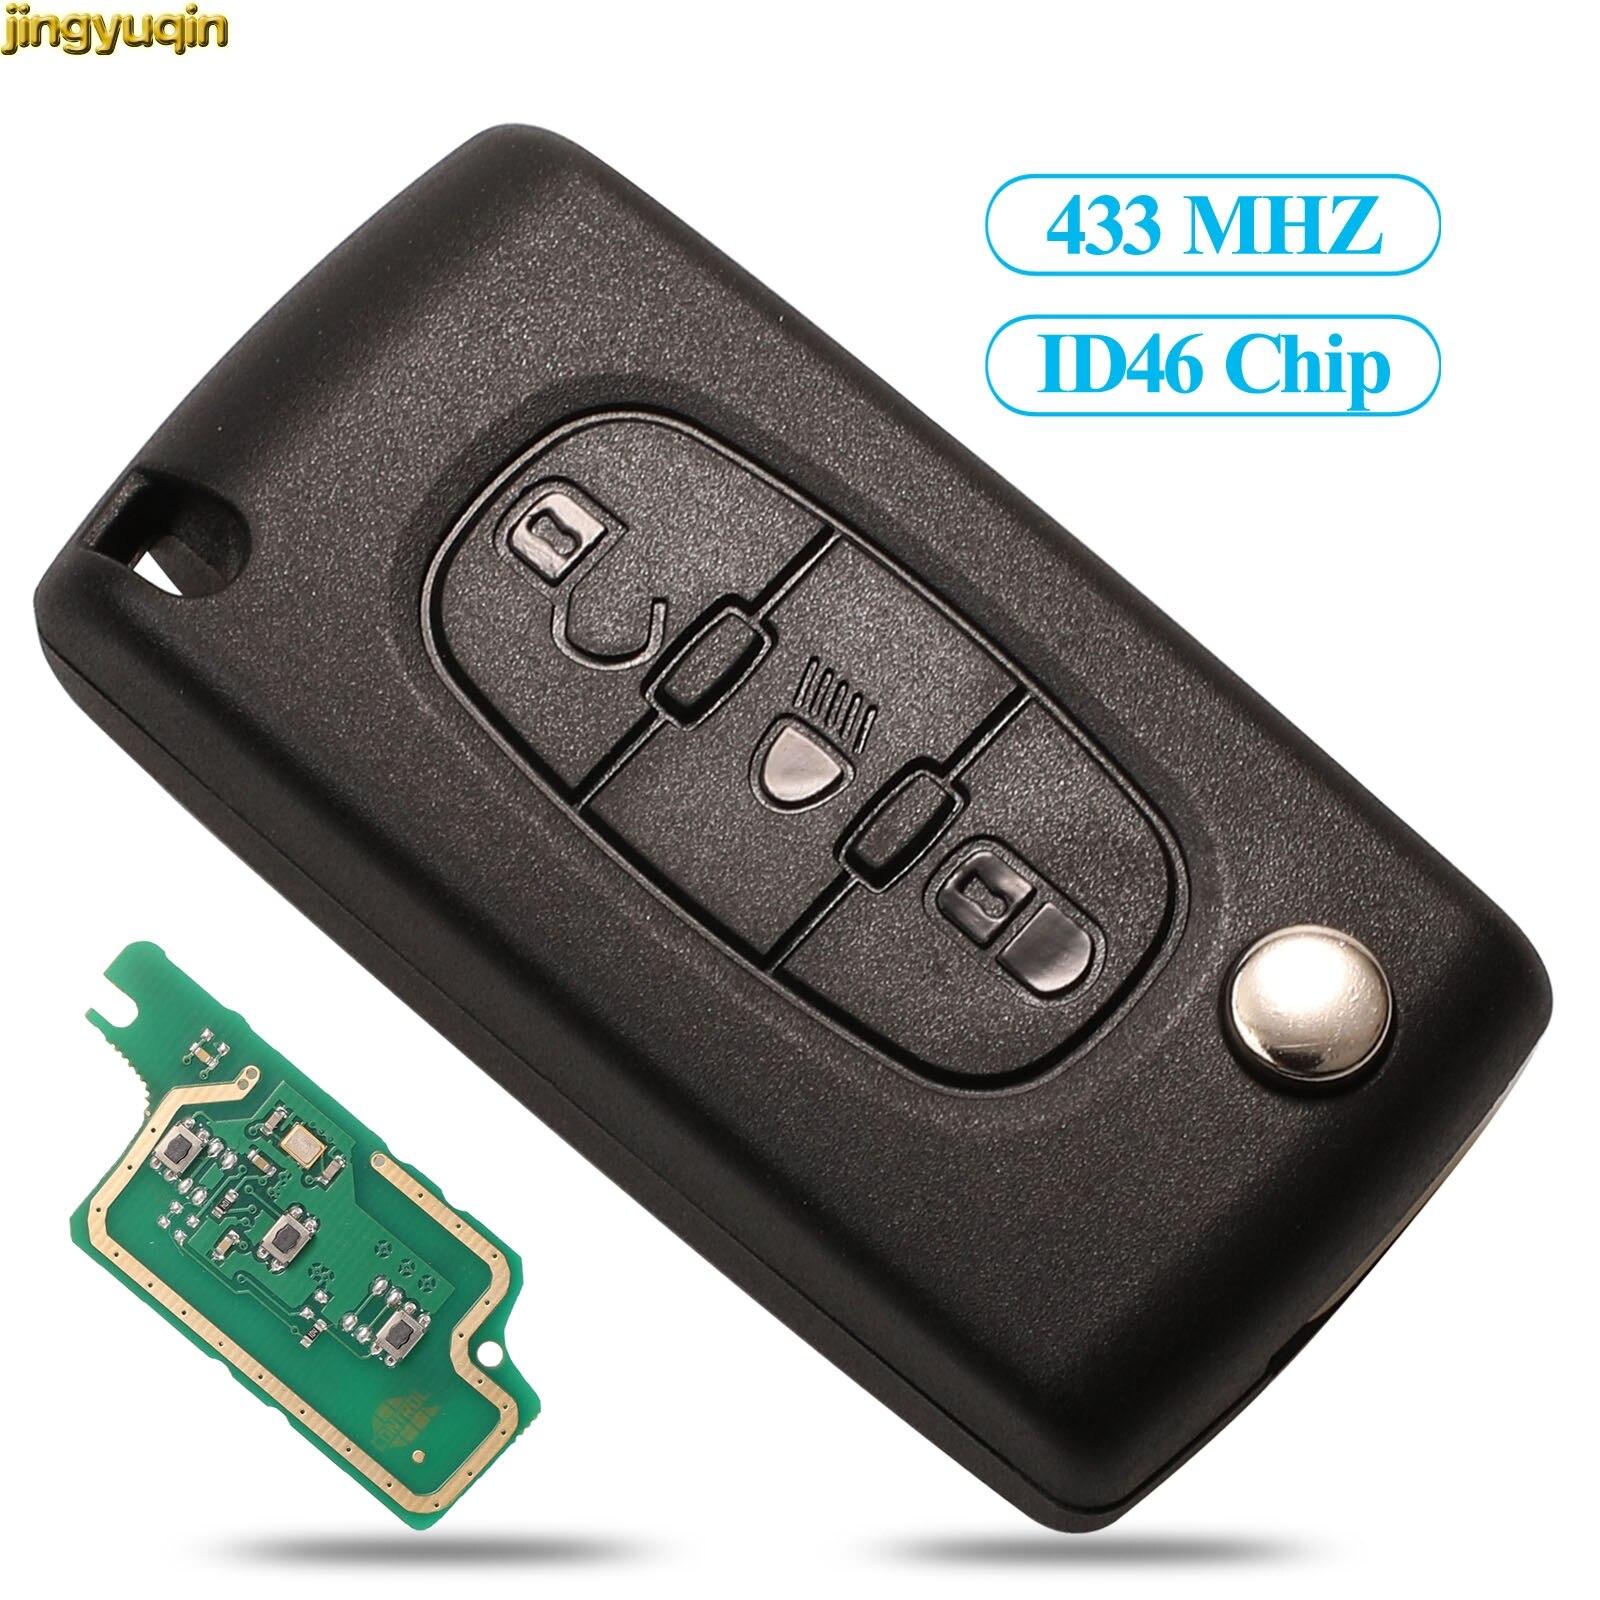 Mando a distancia Jingyuqin para llave de coche ASK/FSK 433MHZ ID46 para Peugeot 407 307 308 607 3 botones luz VA2/HCA Blade CE0523 CE0536